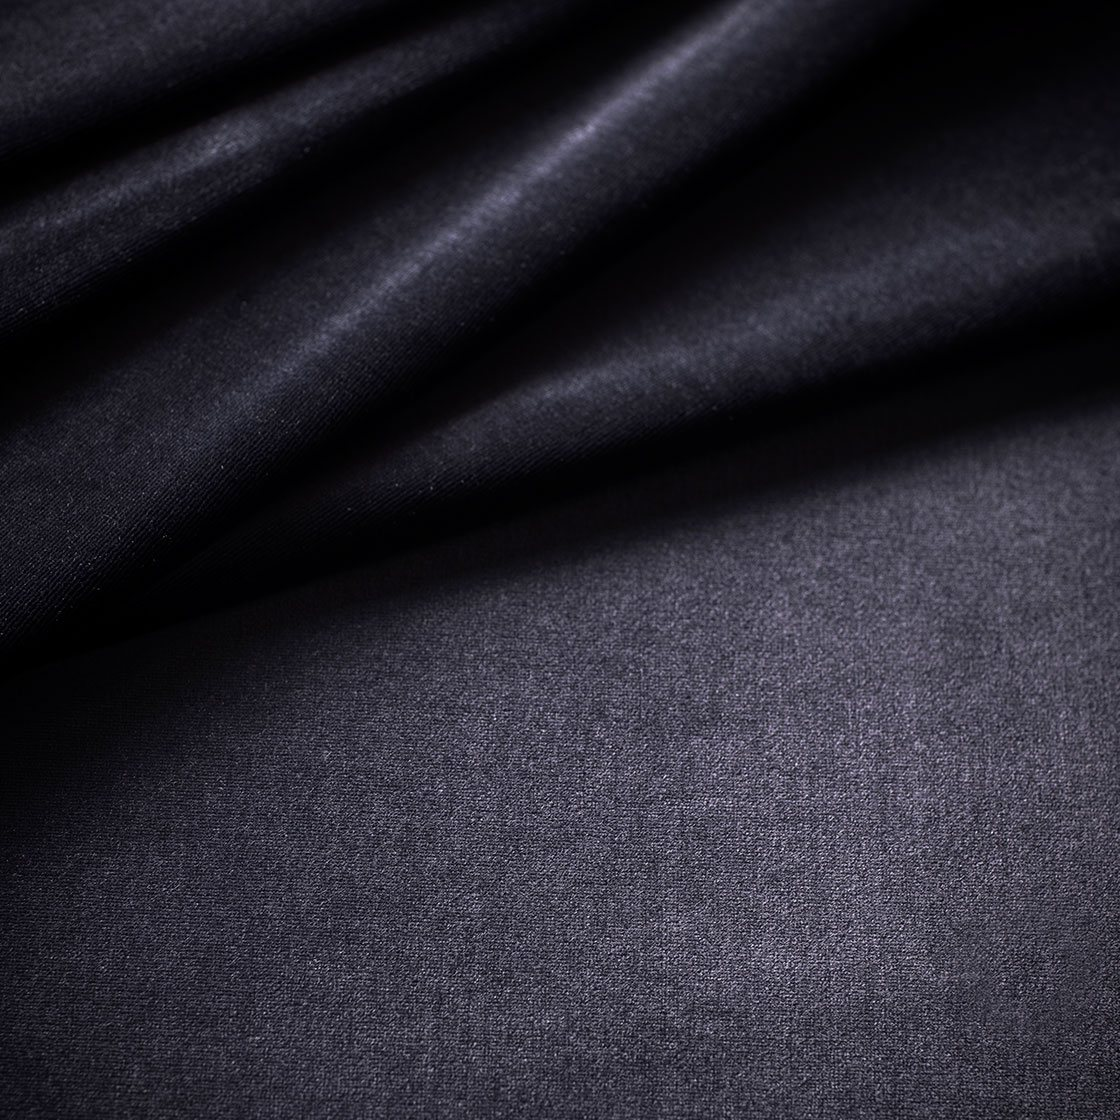 Capri Silk Velvet - Midnight - Beaumont & Fletcher - Beaumont & Fletcher